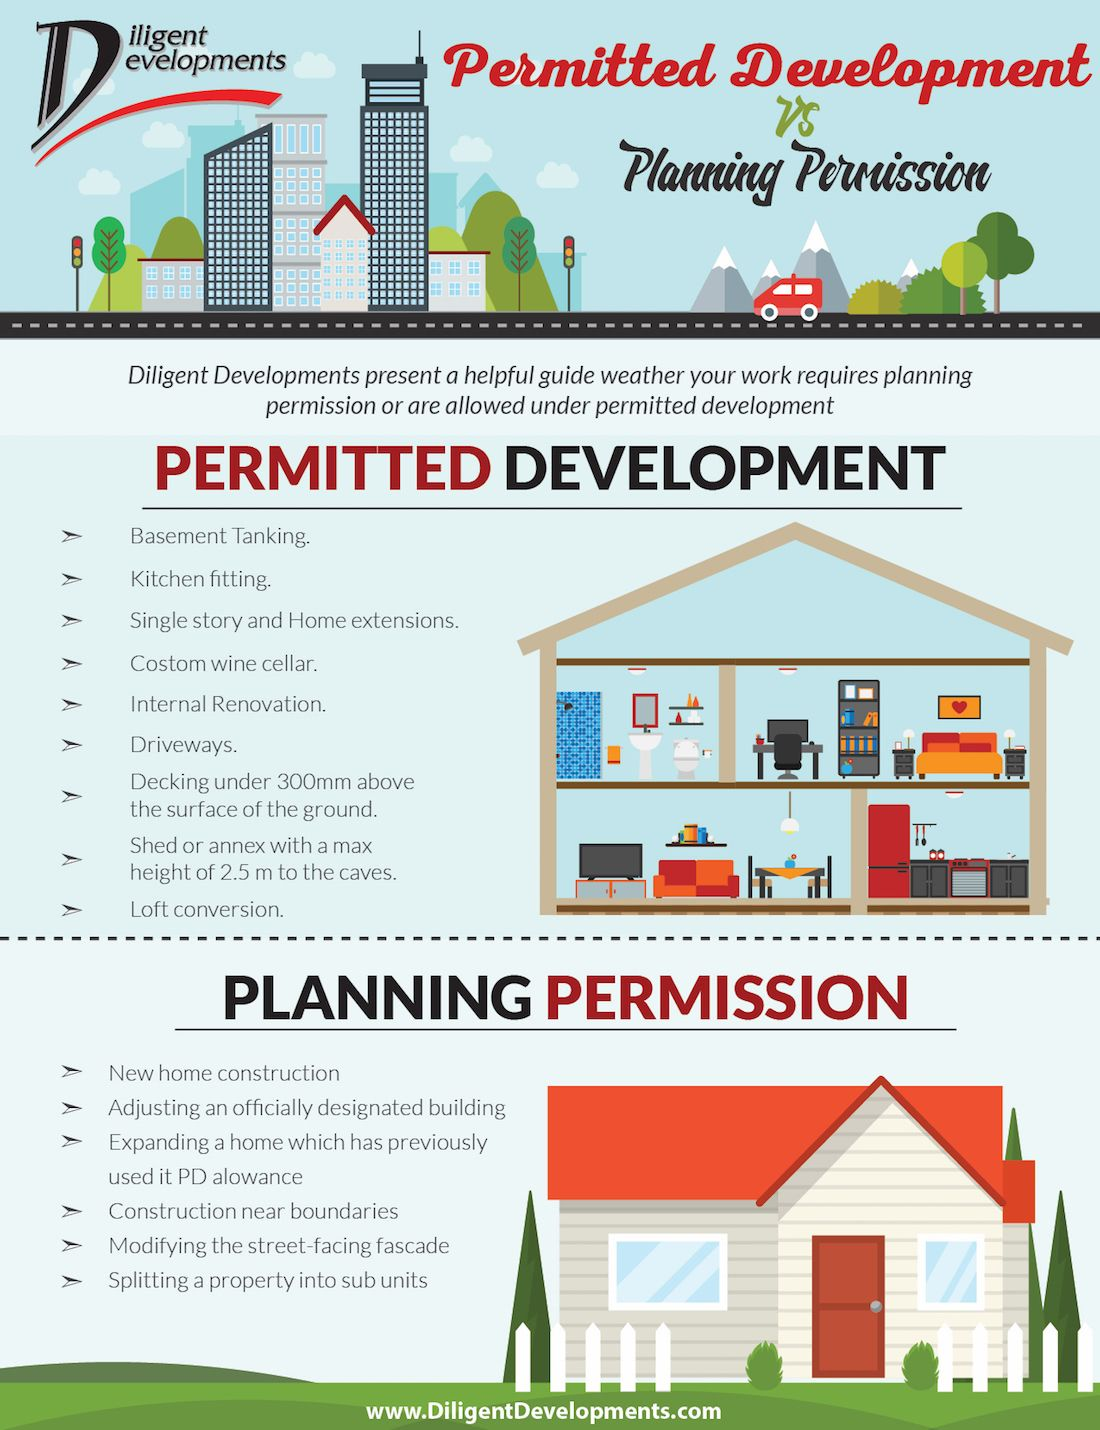 Permitted Development vs Planning Permission